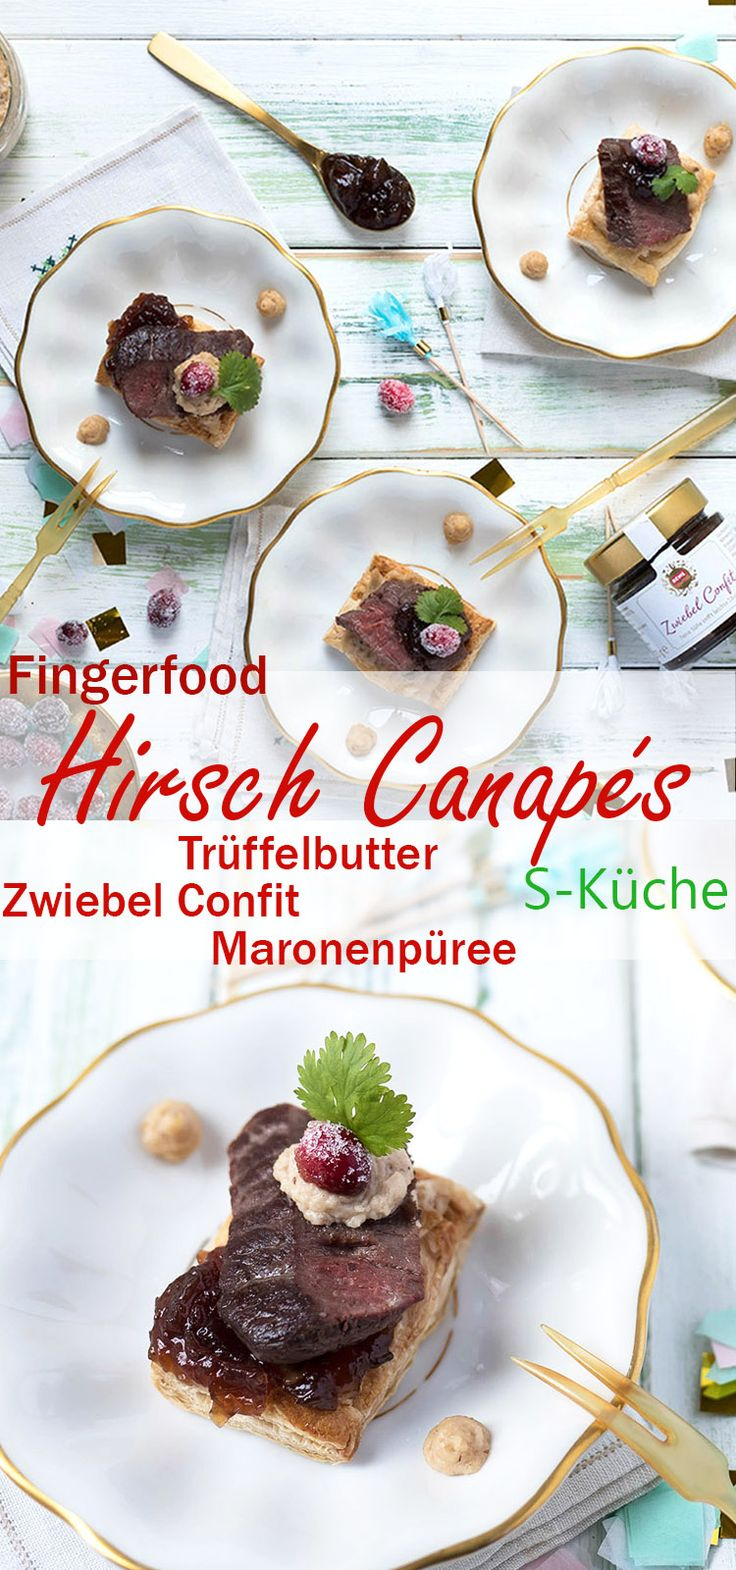 48 best S-Küche - Salad images on Pinterest | Badger, Deutsch and ...